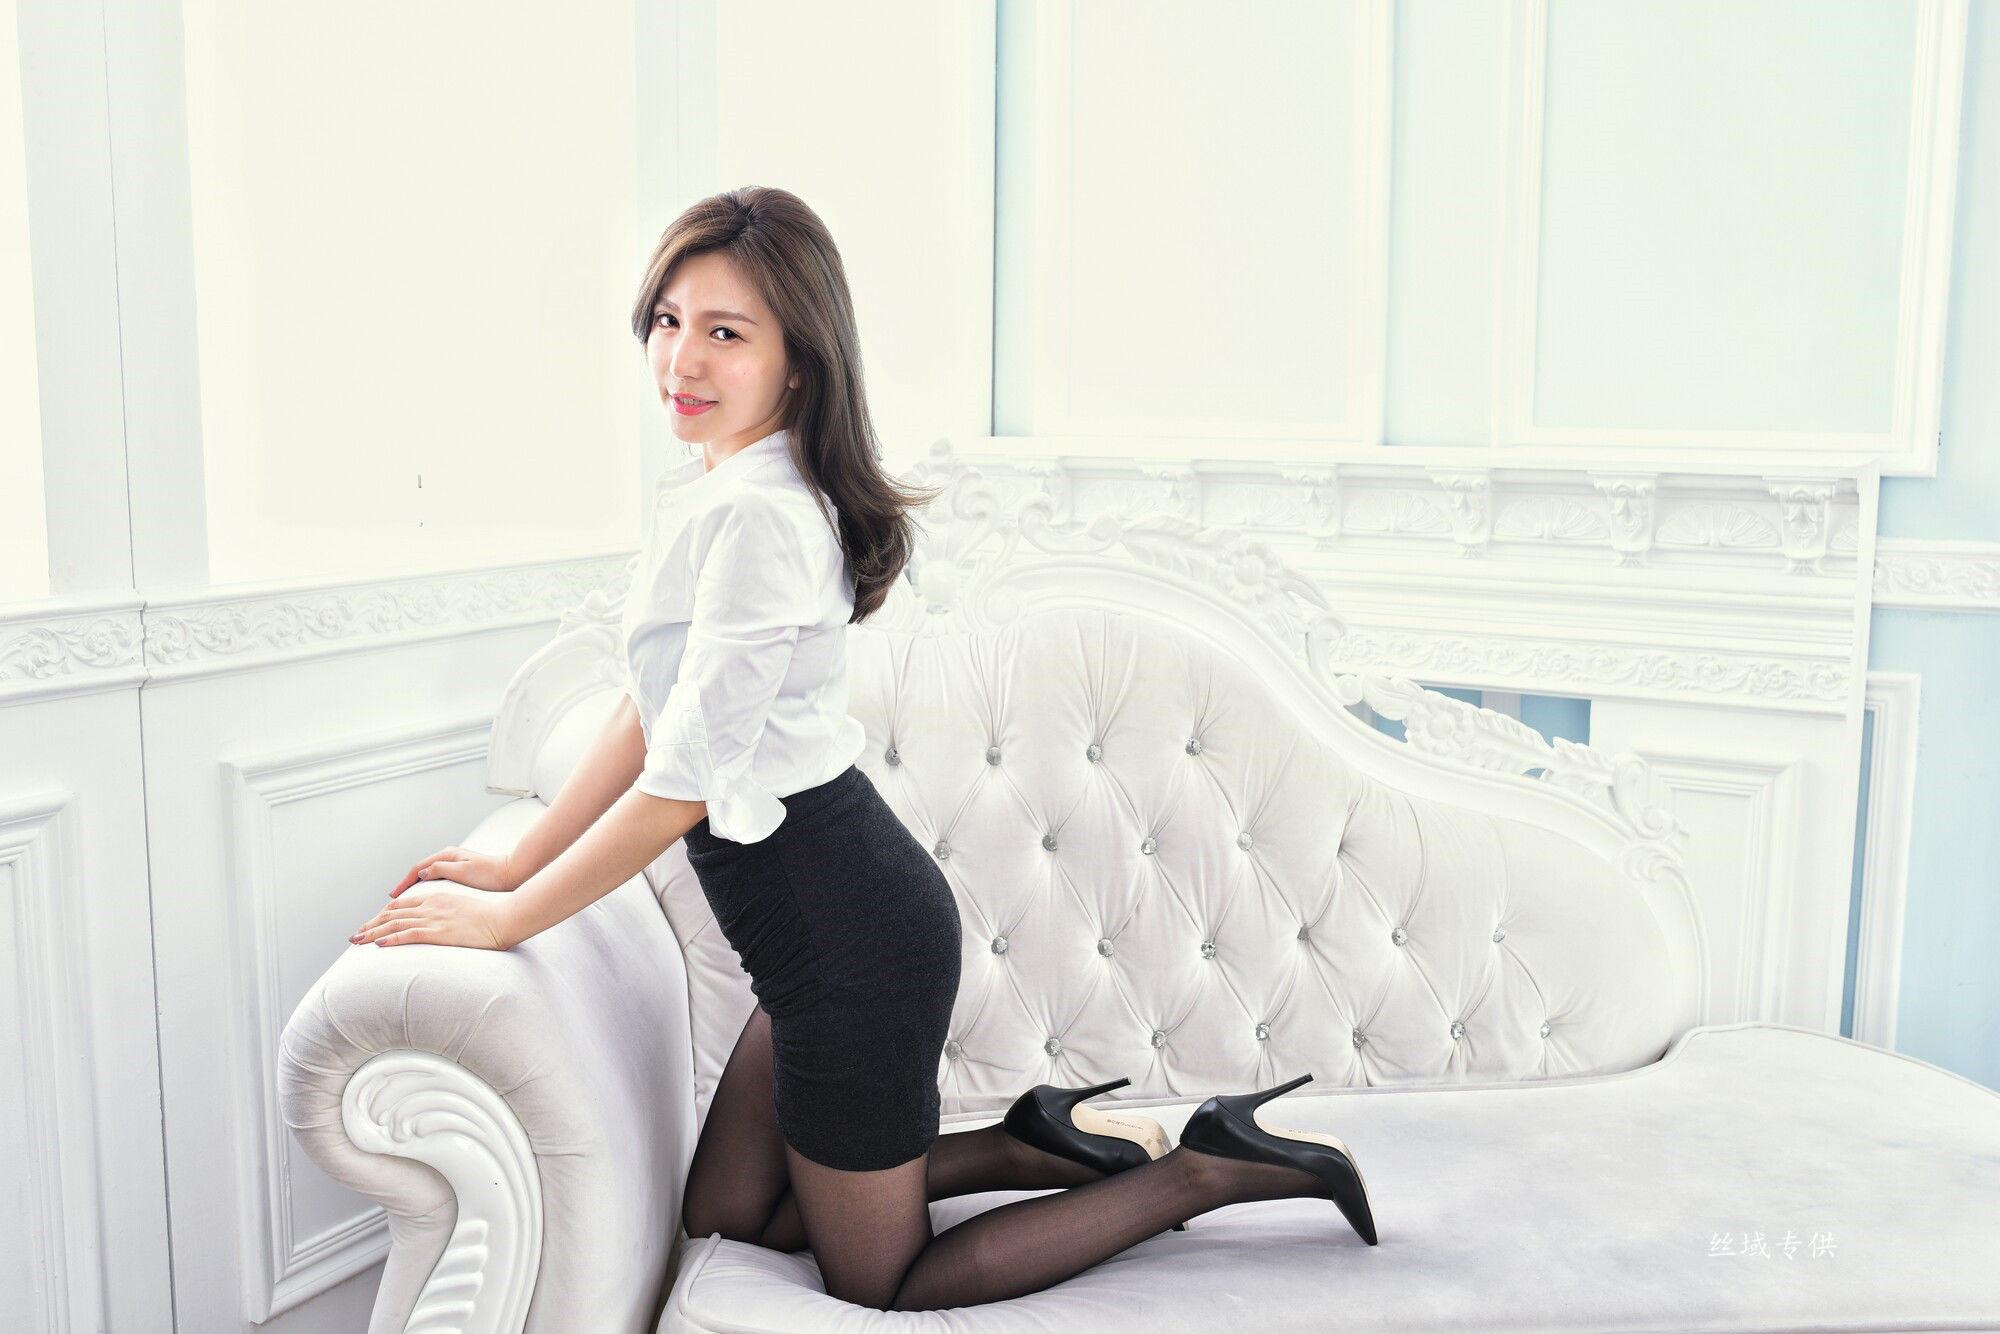 VOL.987 [台湾正妹]黑丝衬衫OL美女:邱爱晨(邱艾比Abbie)超高清个人性感漂亮大图(69P)